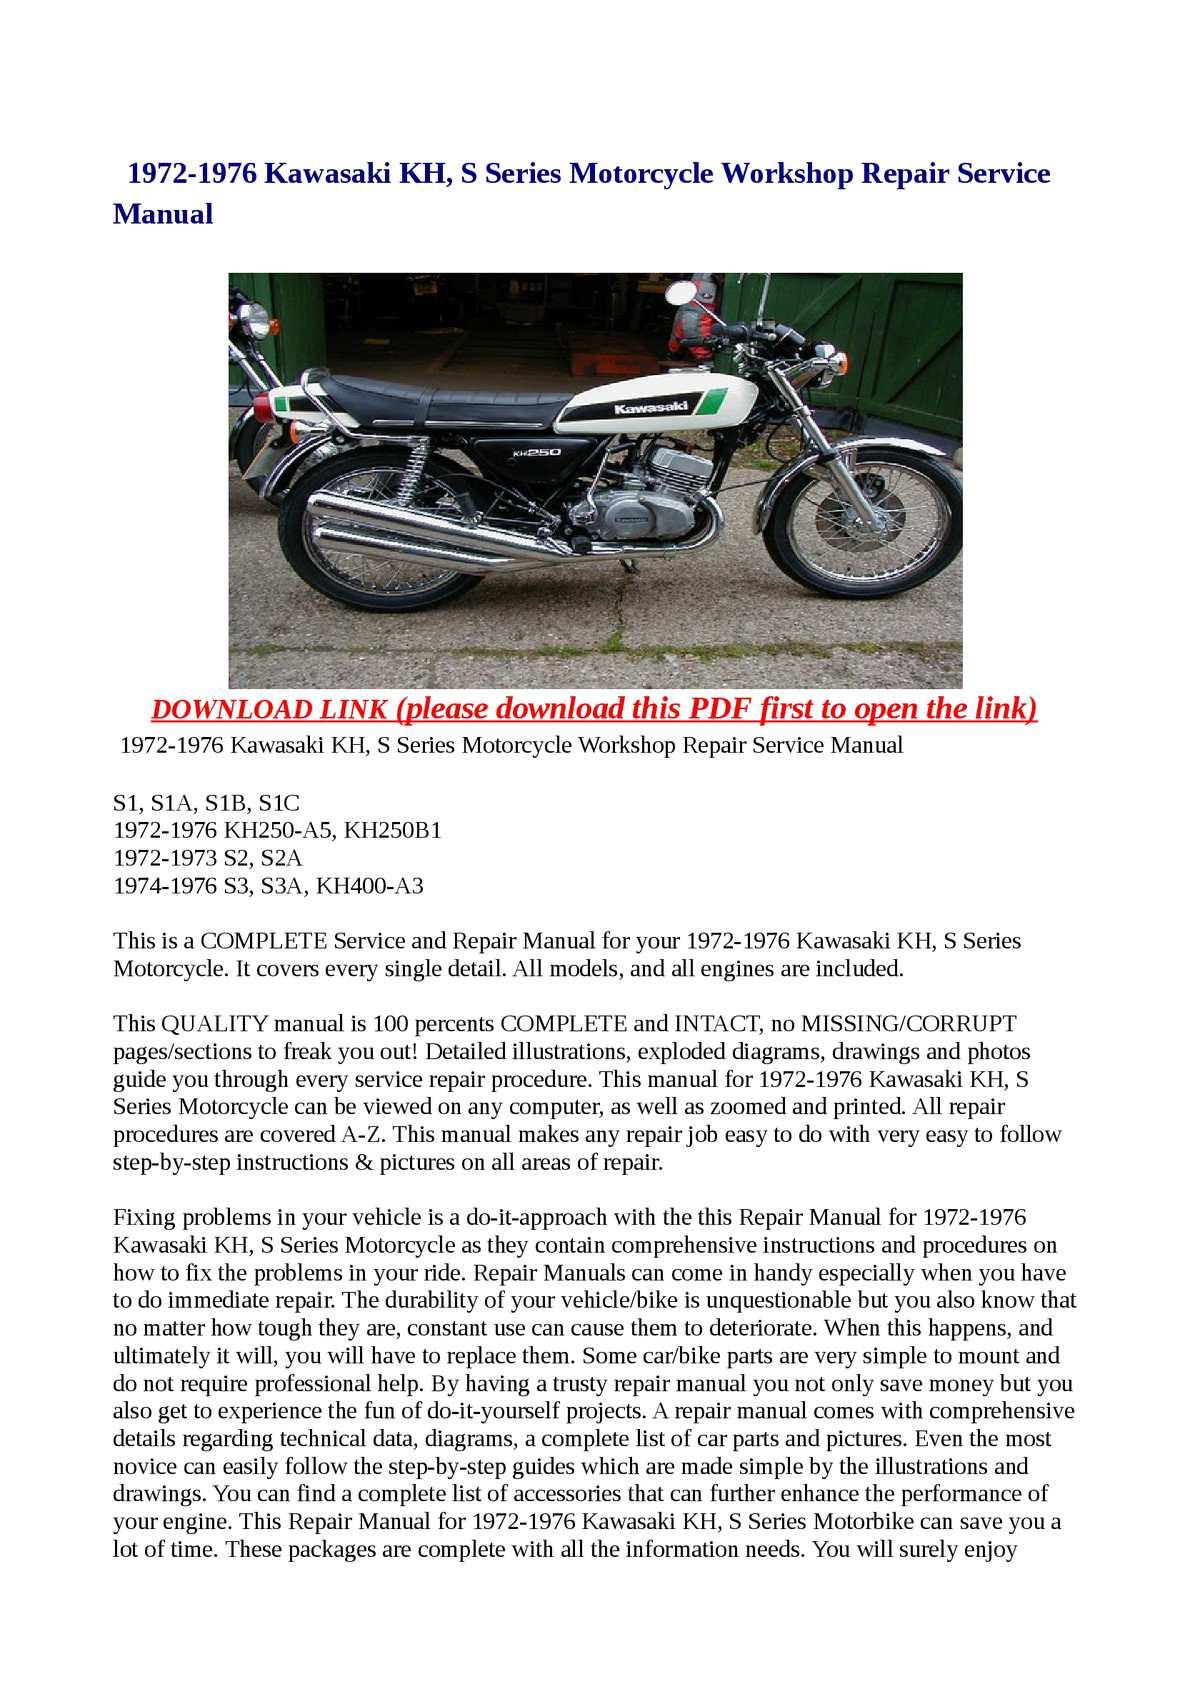 download now kh250 kh400 s1 s2 s3 service repair workshop manual instant download